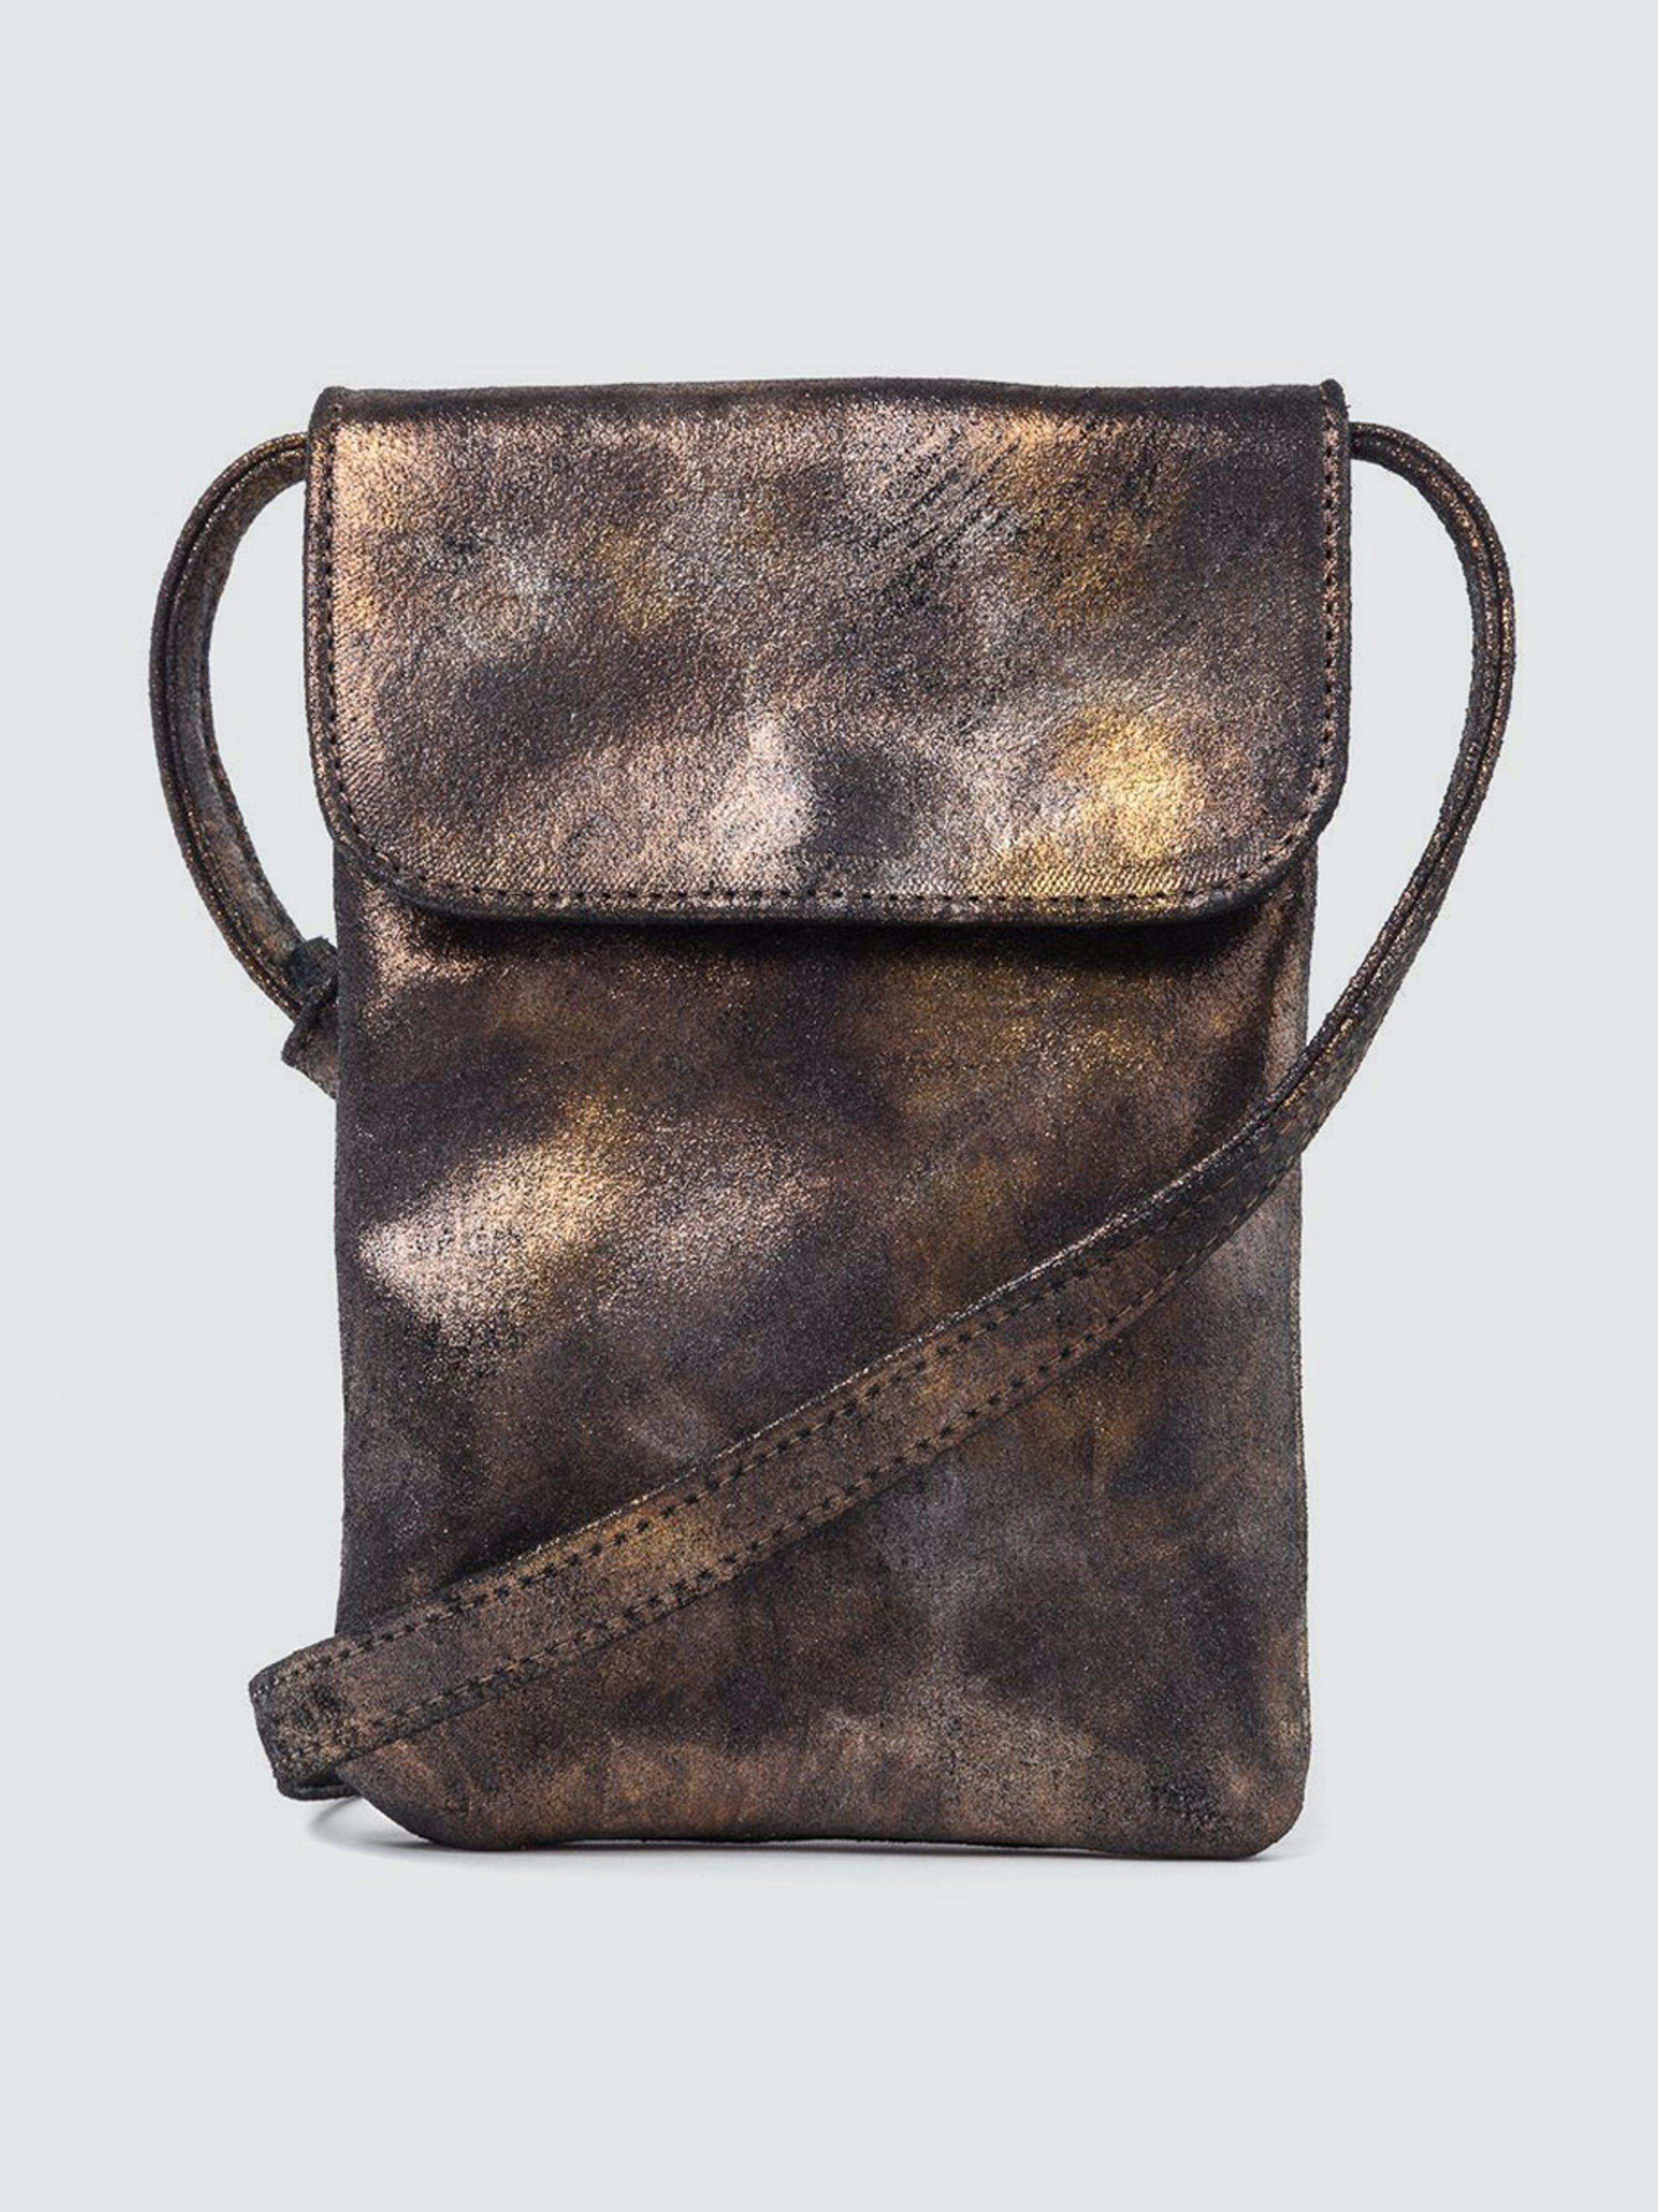 CoFi Leathers Penny Phone Bag: Black Gold Metallic  - Black